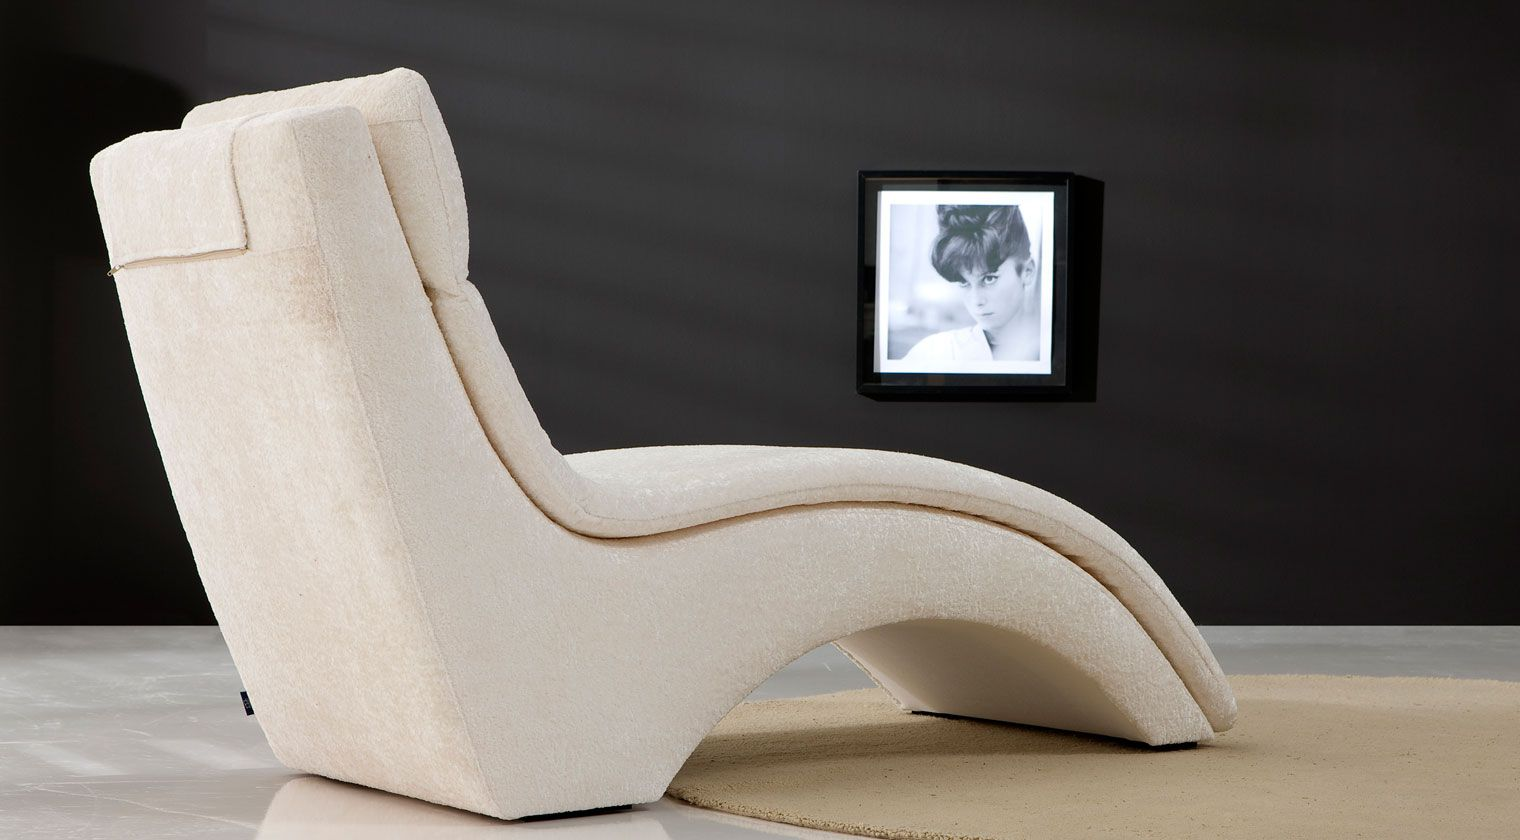 Butaca chaiselongue sicilia butacas chaiselongue - Butaca chaise longue ...